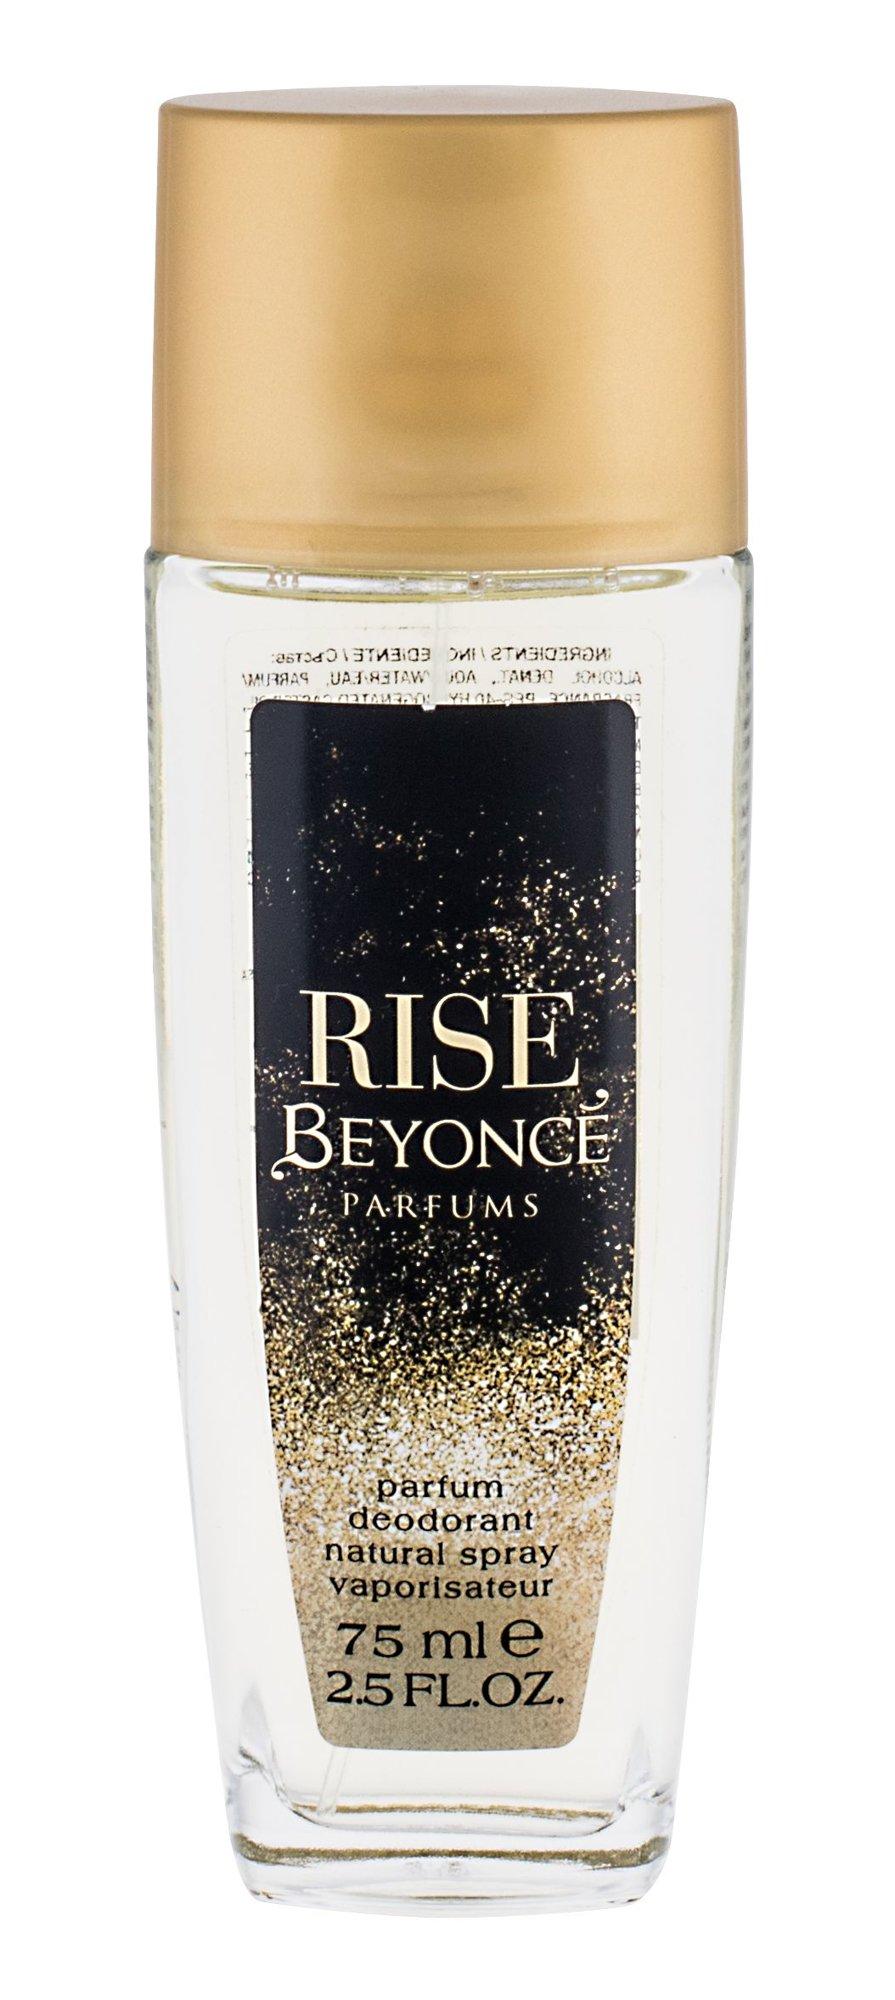 Beyonce Rise Deodorant 75ml